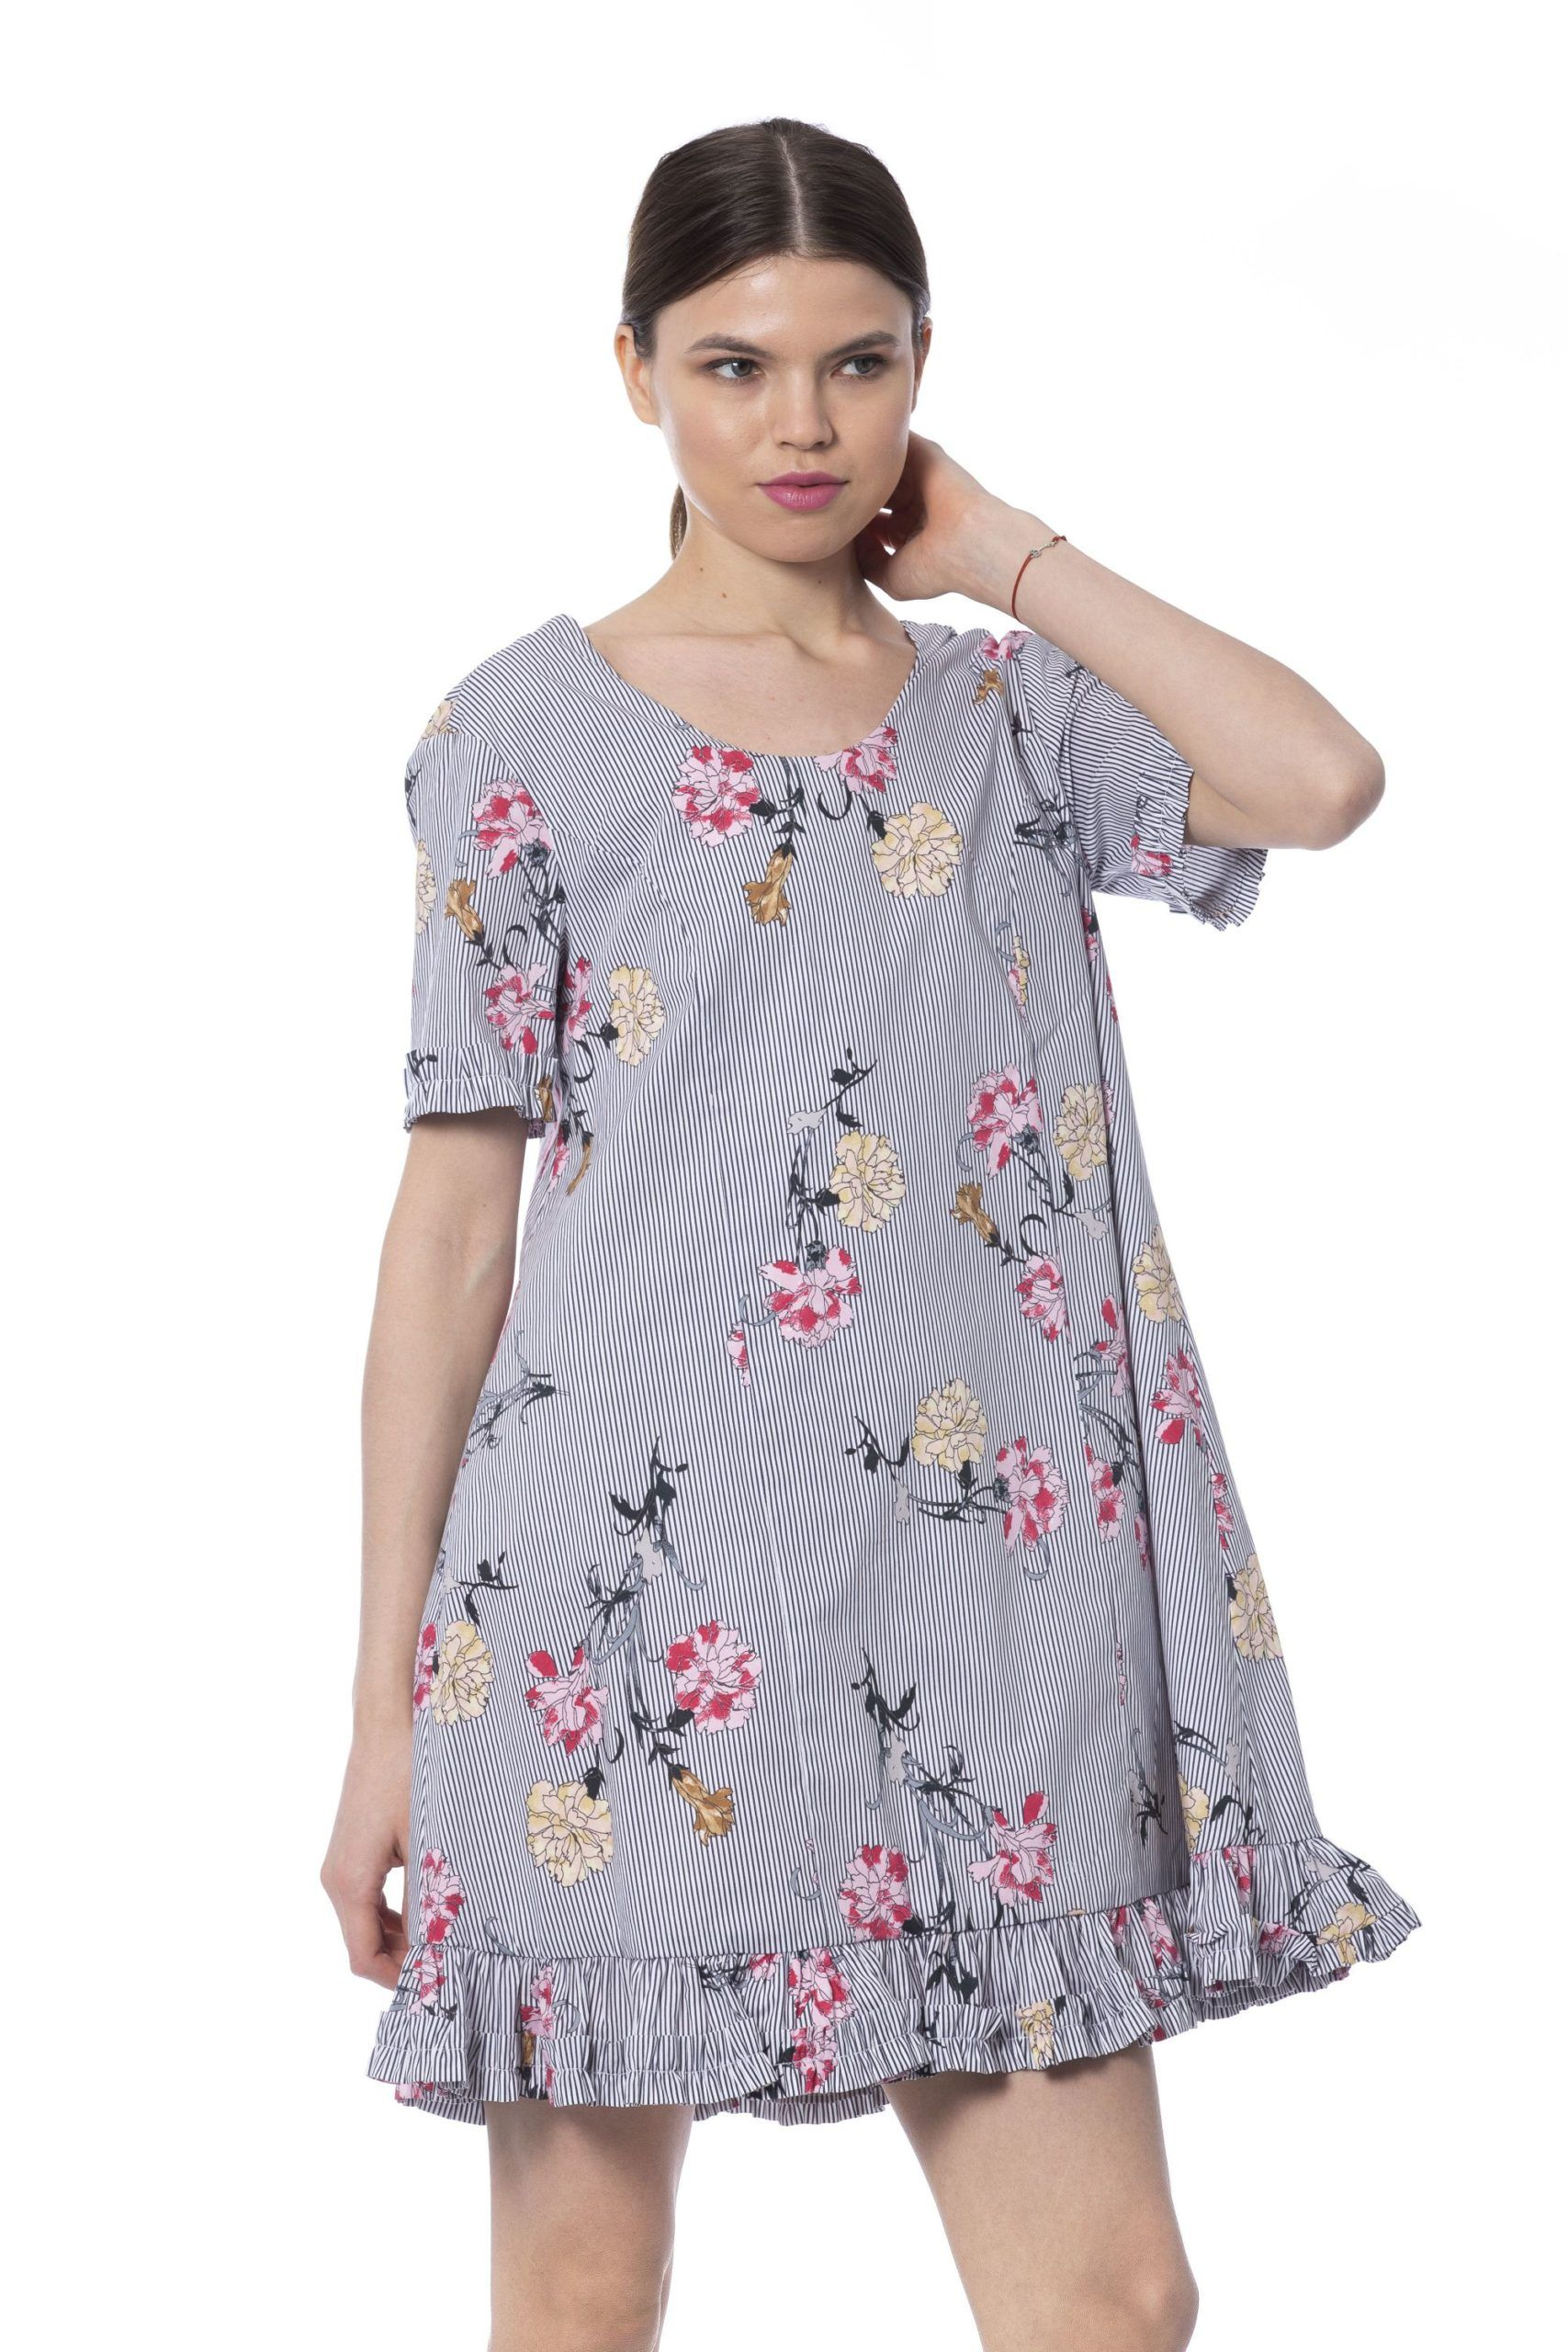 Silvian Heach Fantasyunique Dress